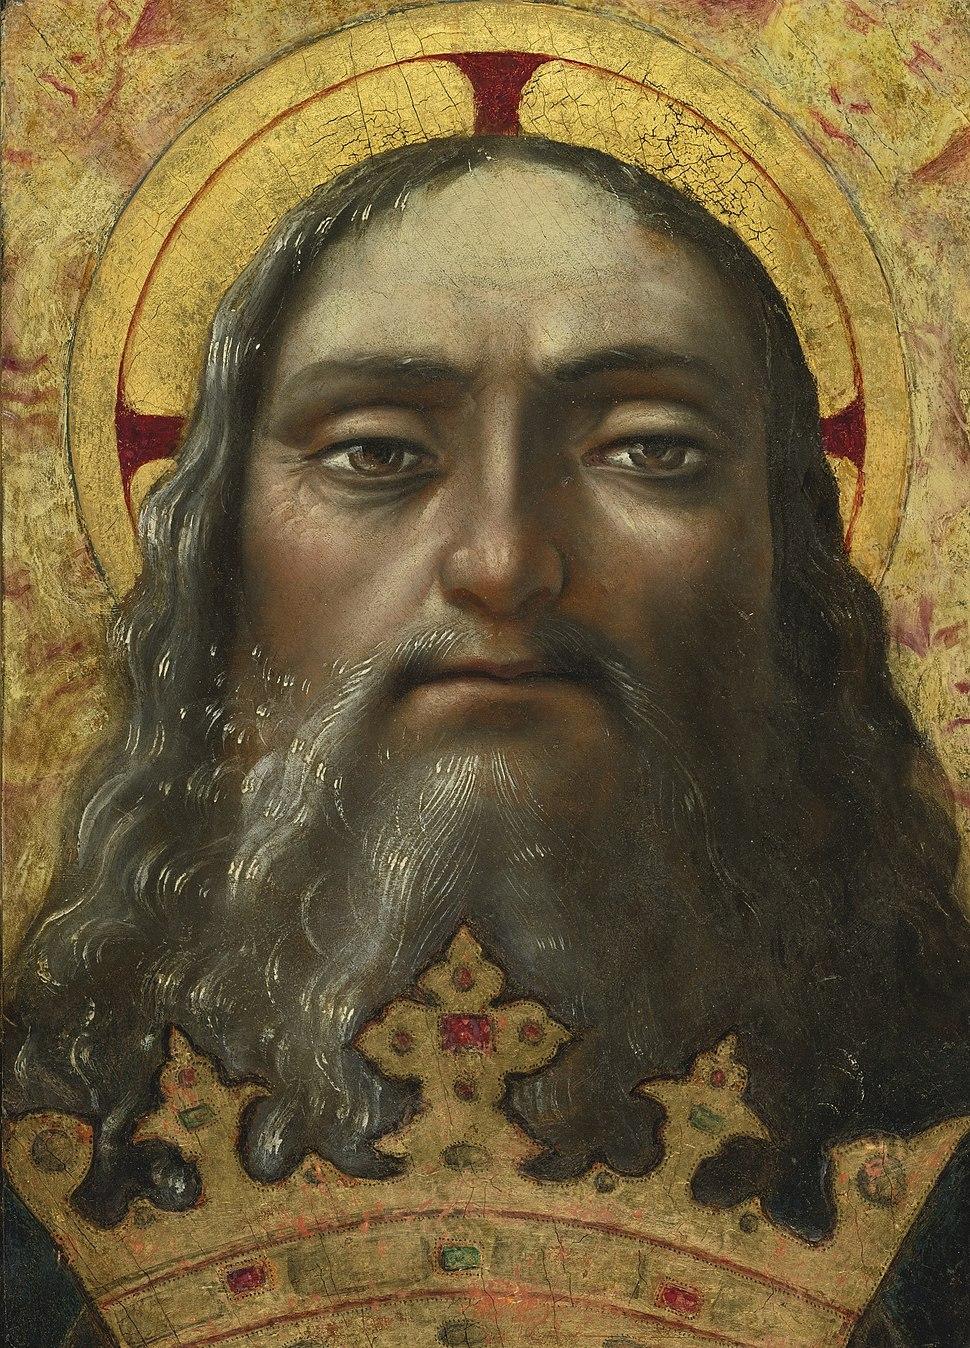 Central Italian School 16th century Head of God the Father